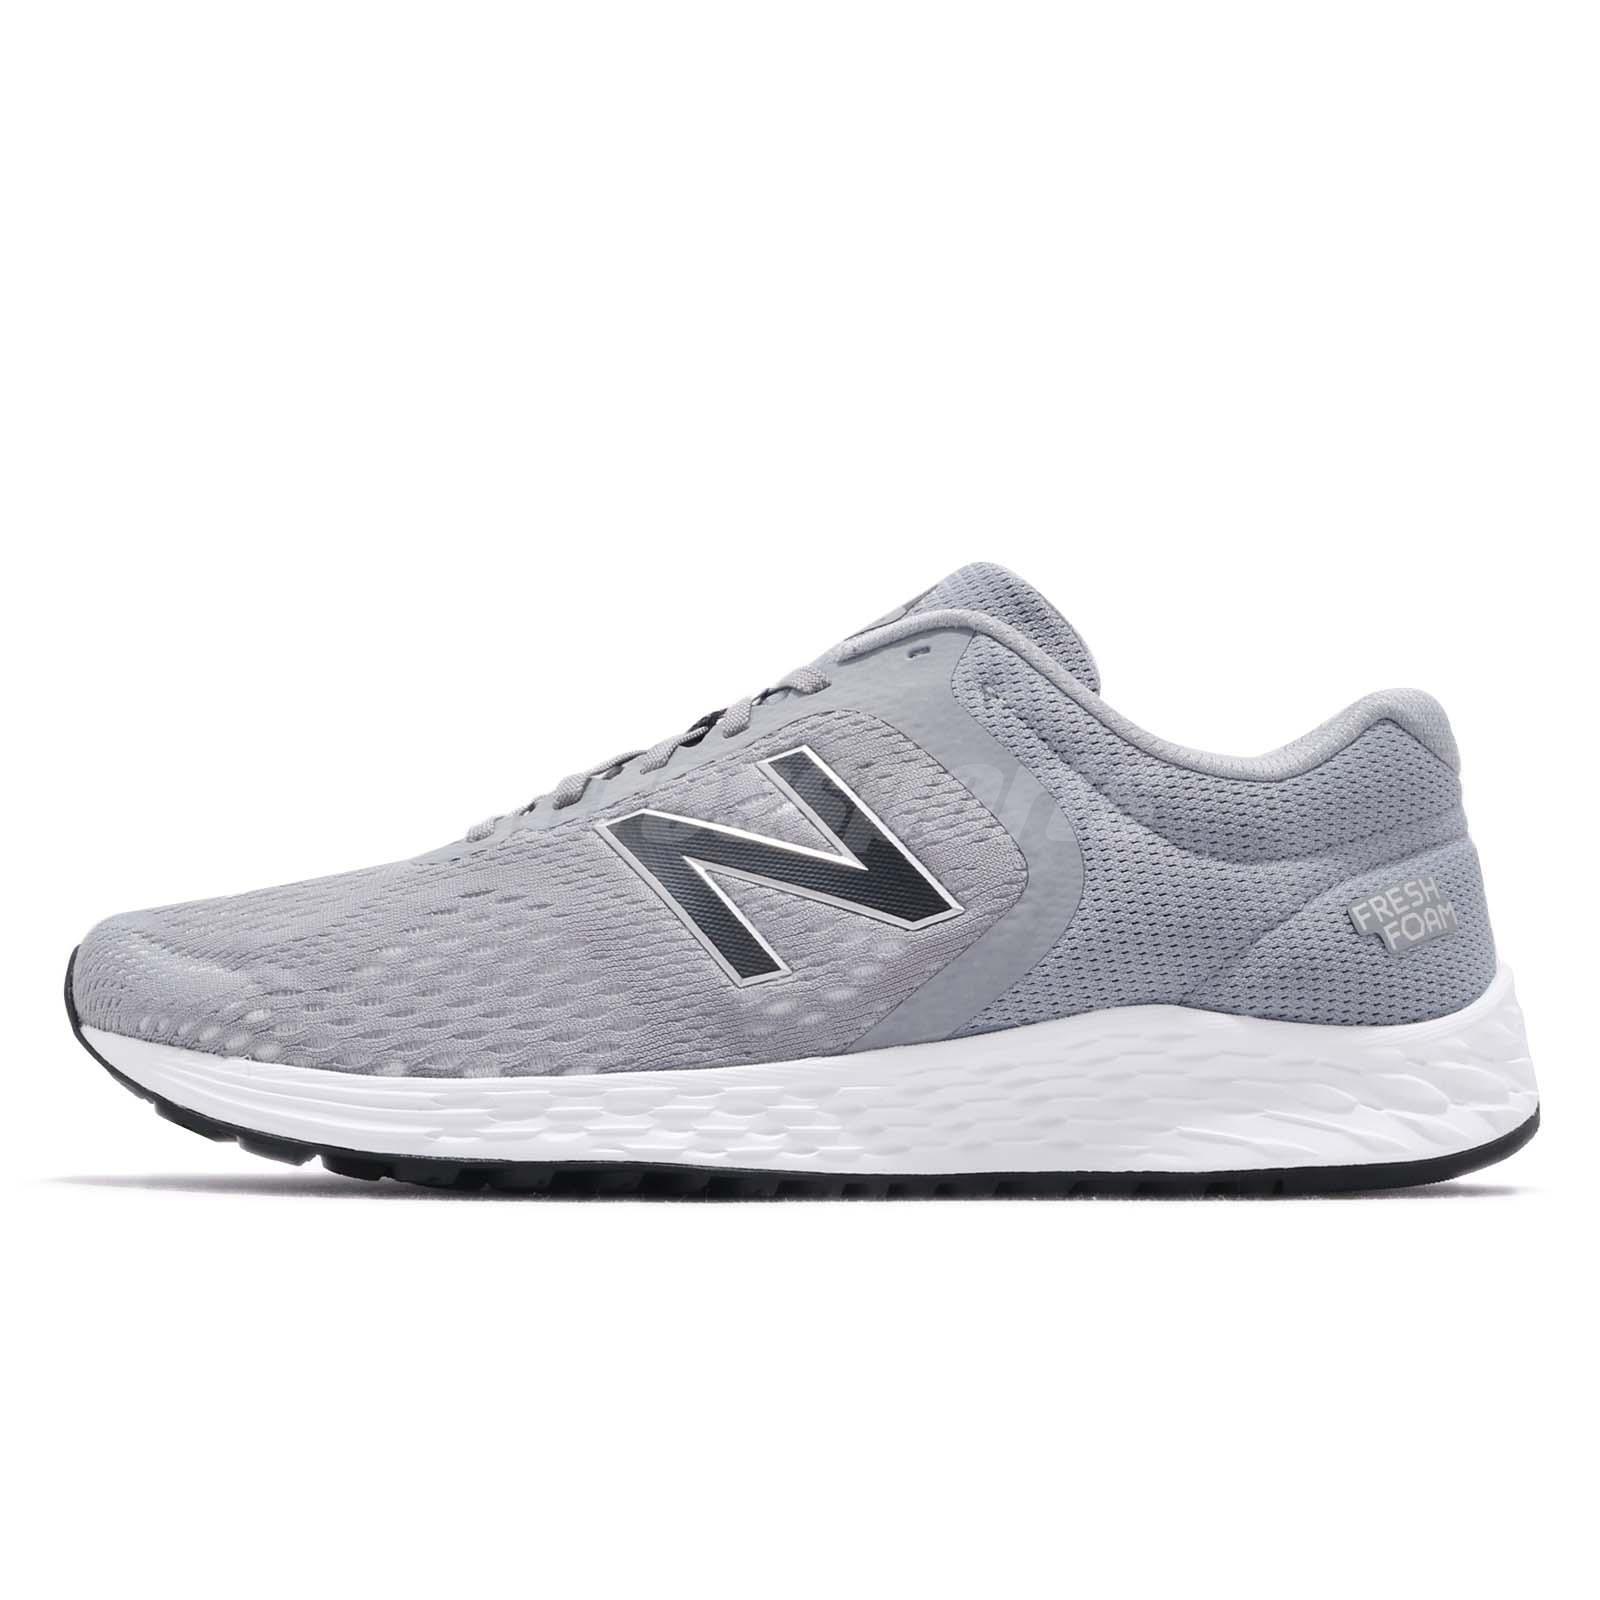 New Balance M680LK6 4E Extra Wide Black Silver Men Running Shoes M680LK64E